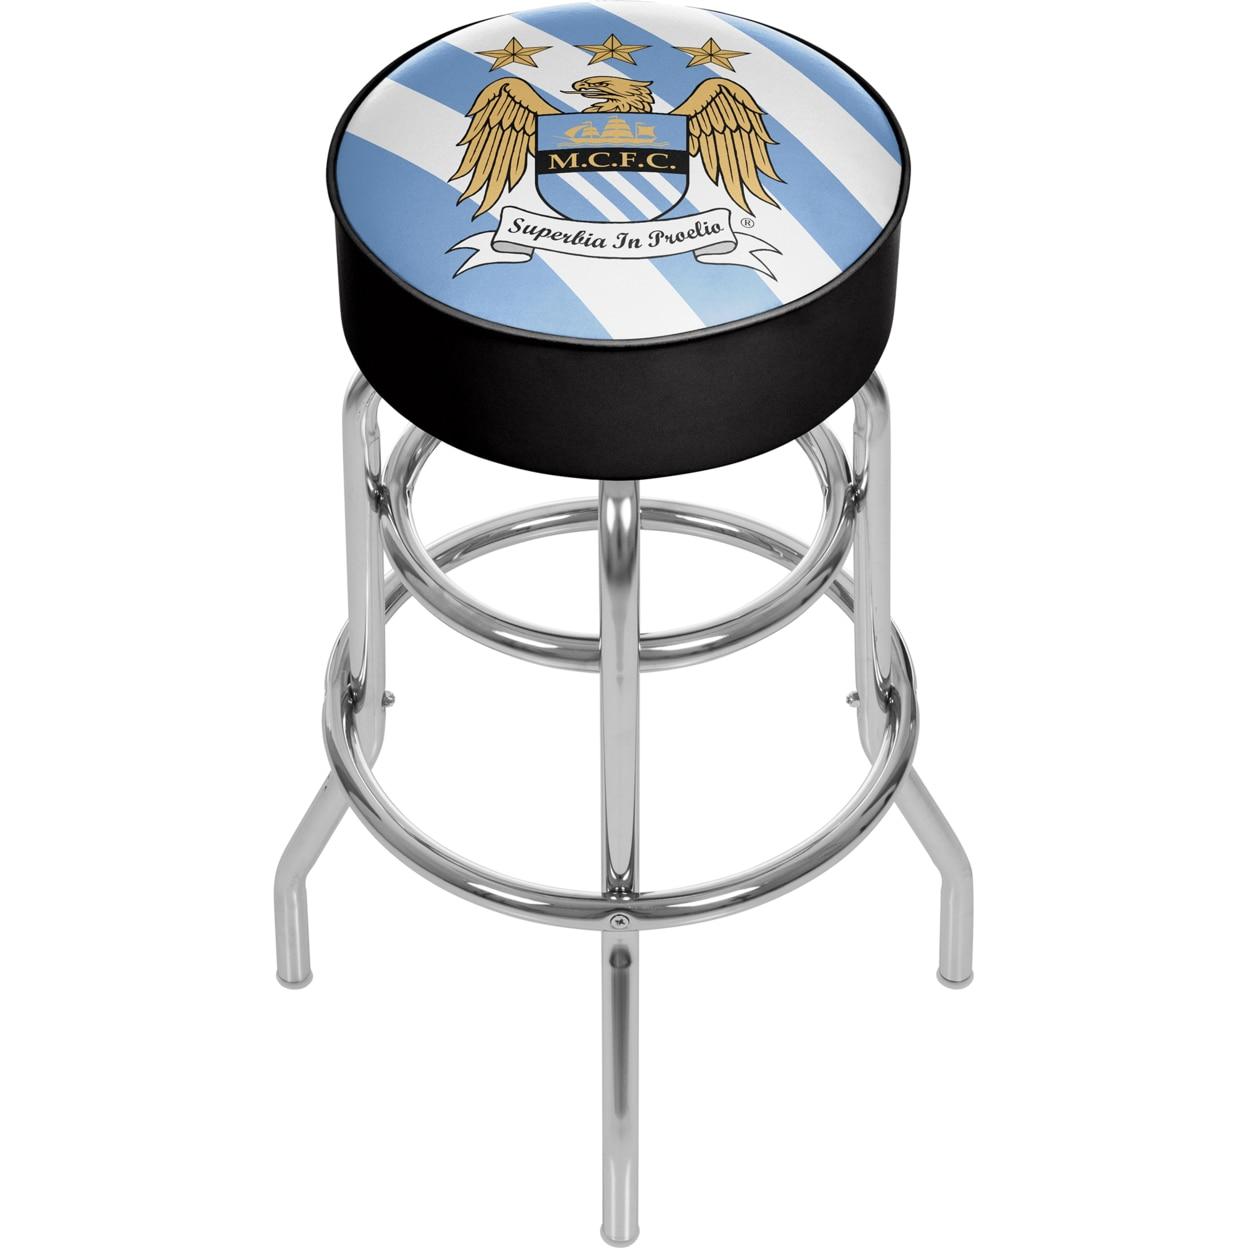 Premier League Manchester City Padded Swivel Bar Stool 30 Inches High premier league liverpool football club chrome 42 inch pub table